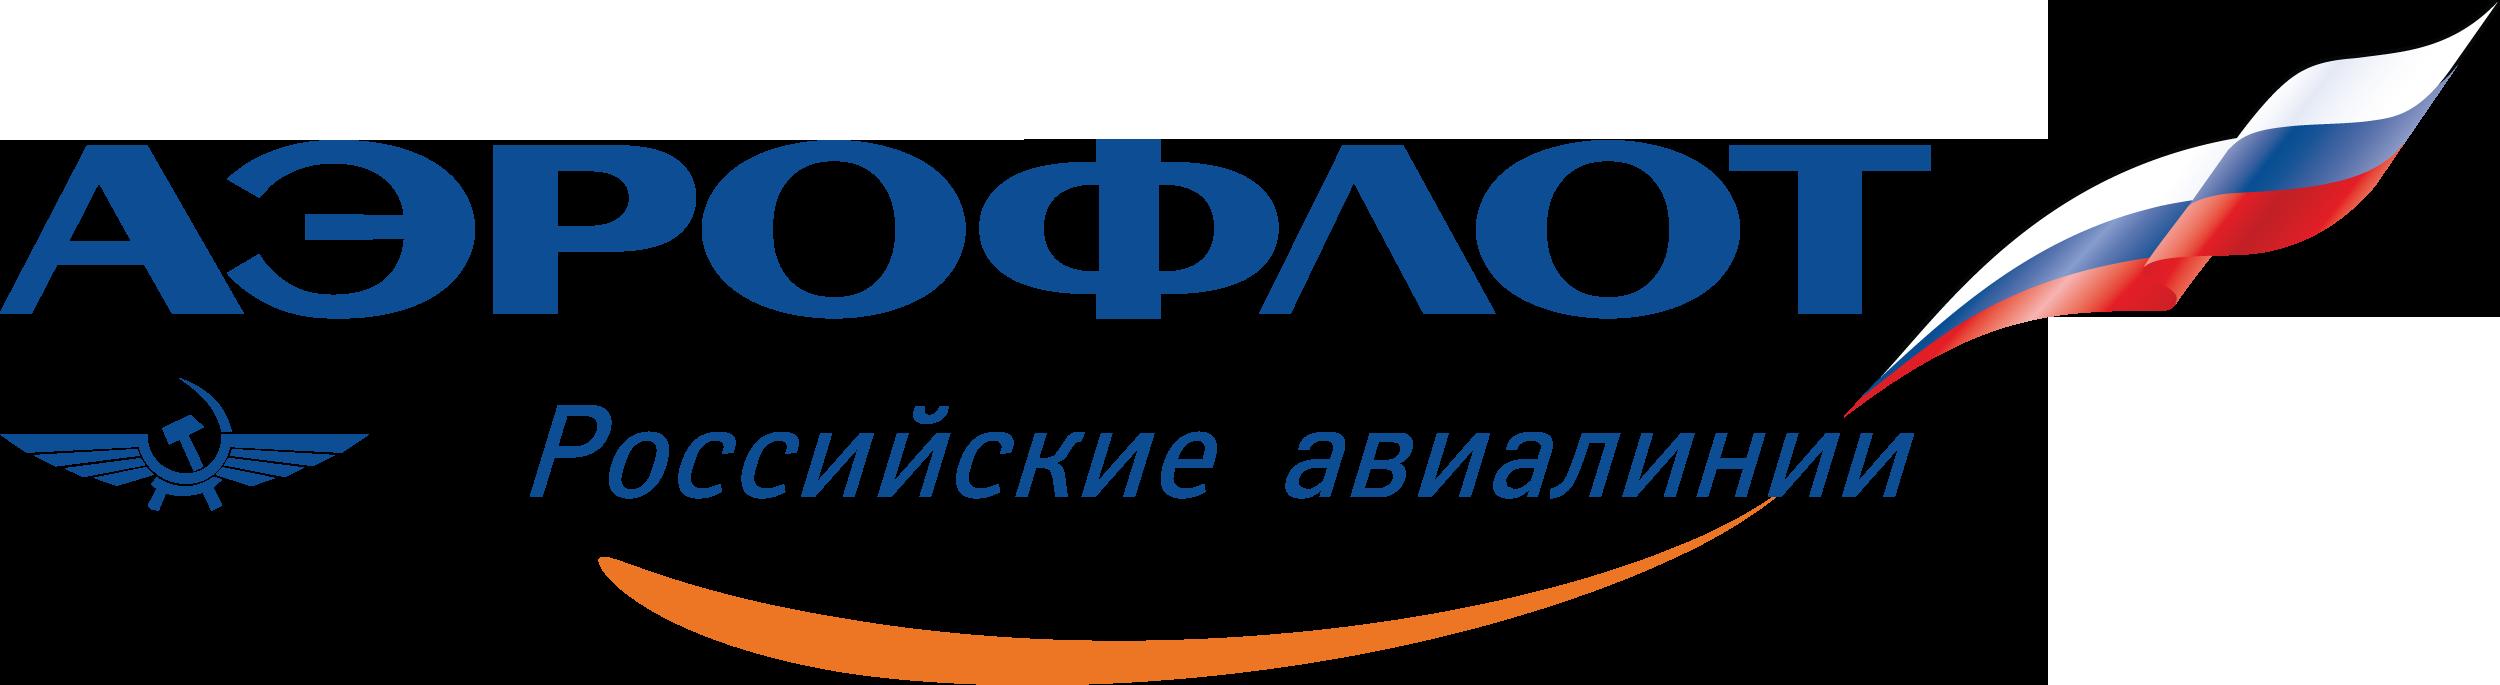 "логотип ""Аэрофлота"""